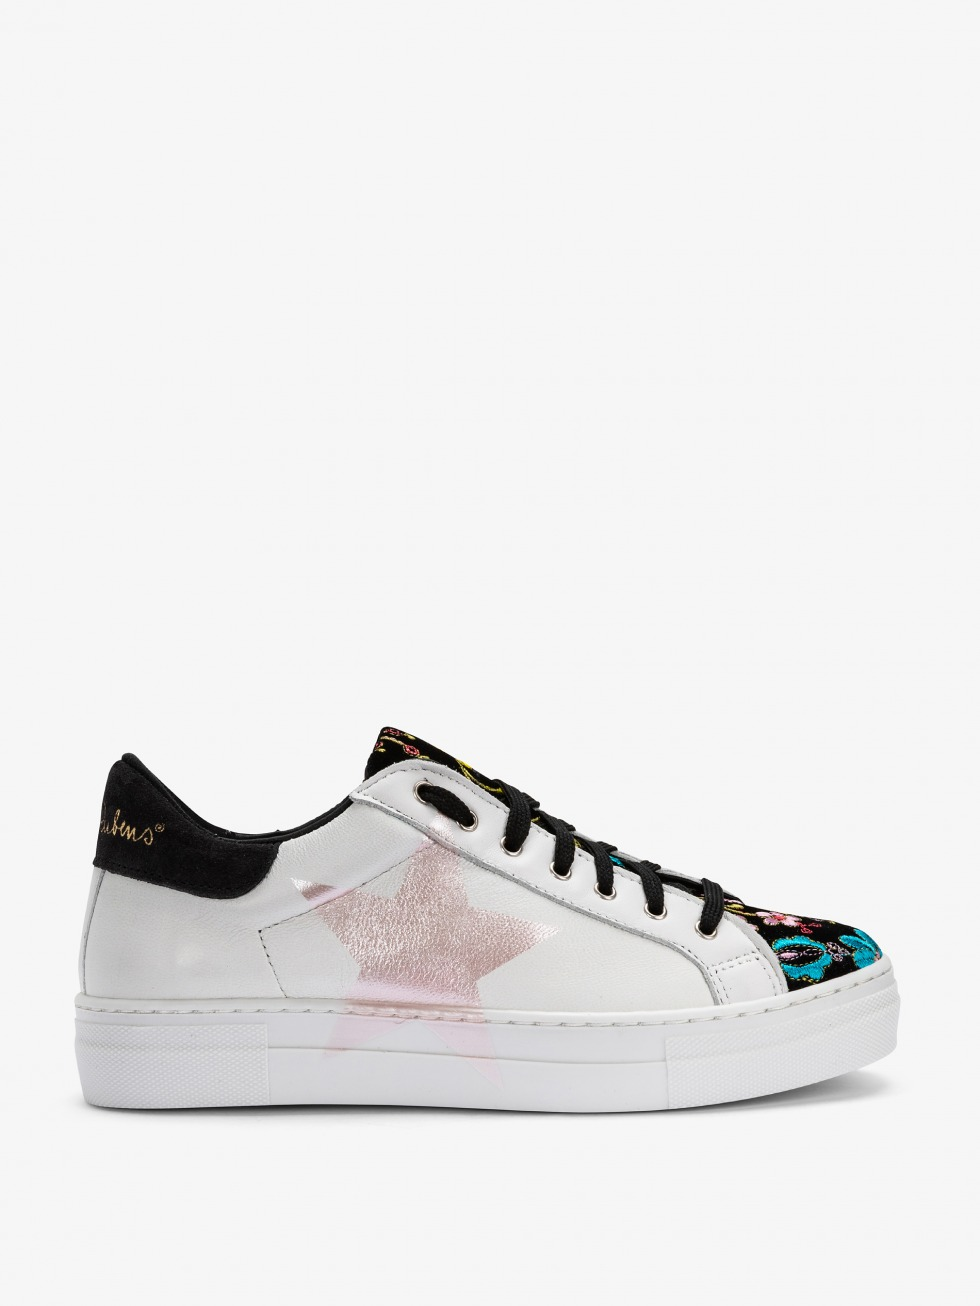 Martini Flowers Sneakers - Quartz Star